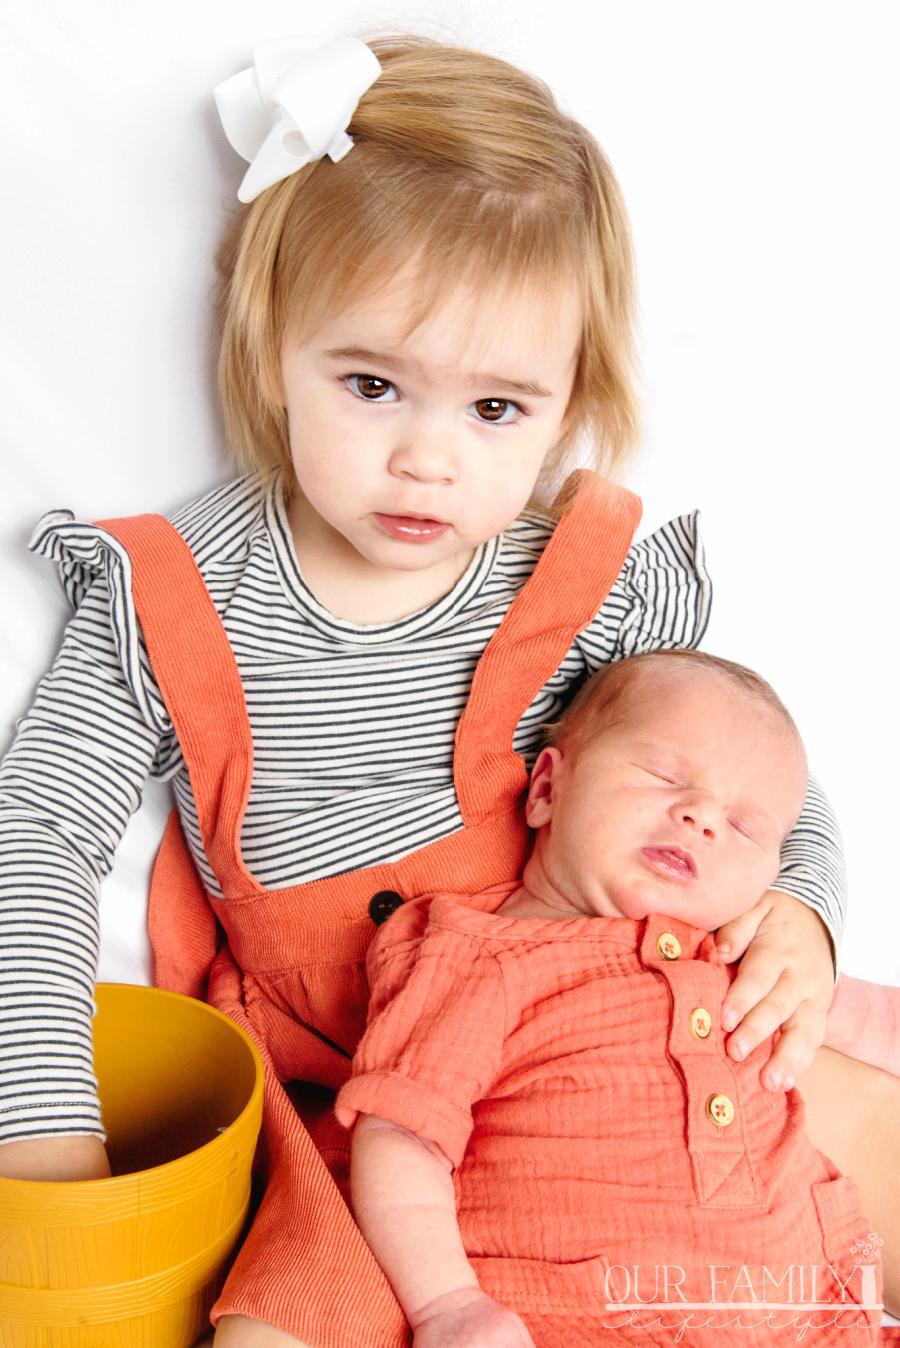 toddler and newborn baby in orange